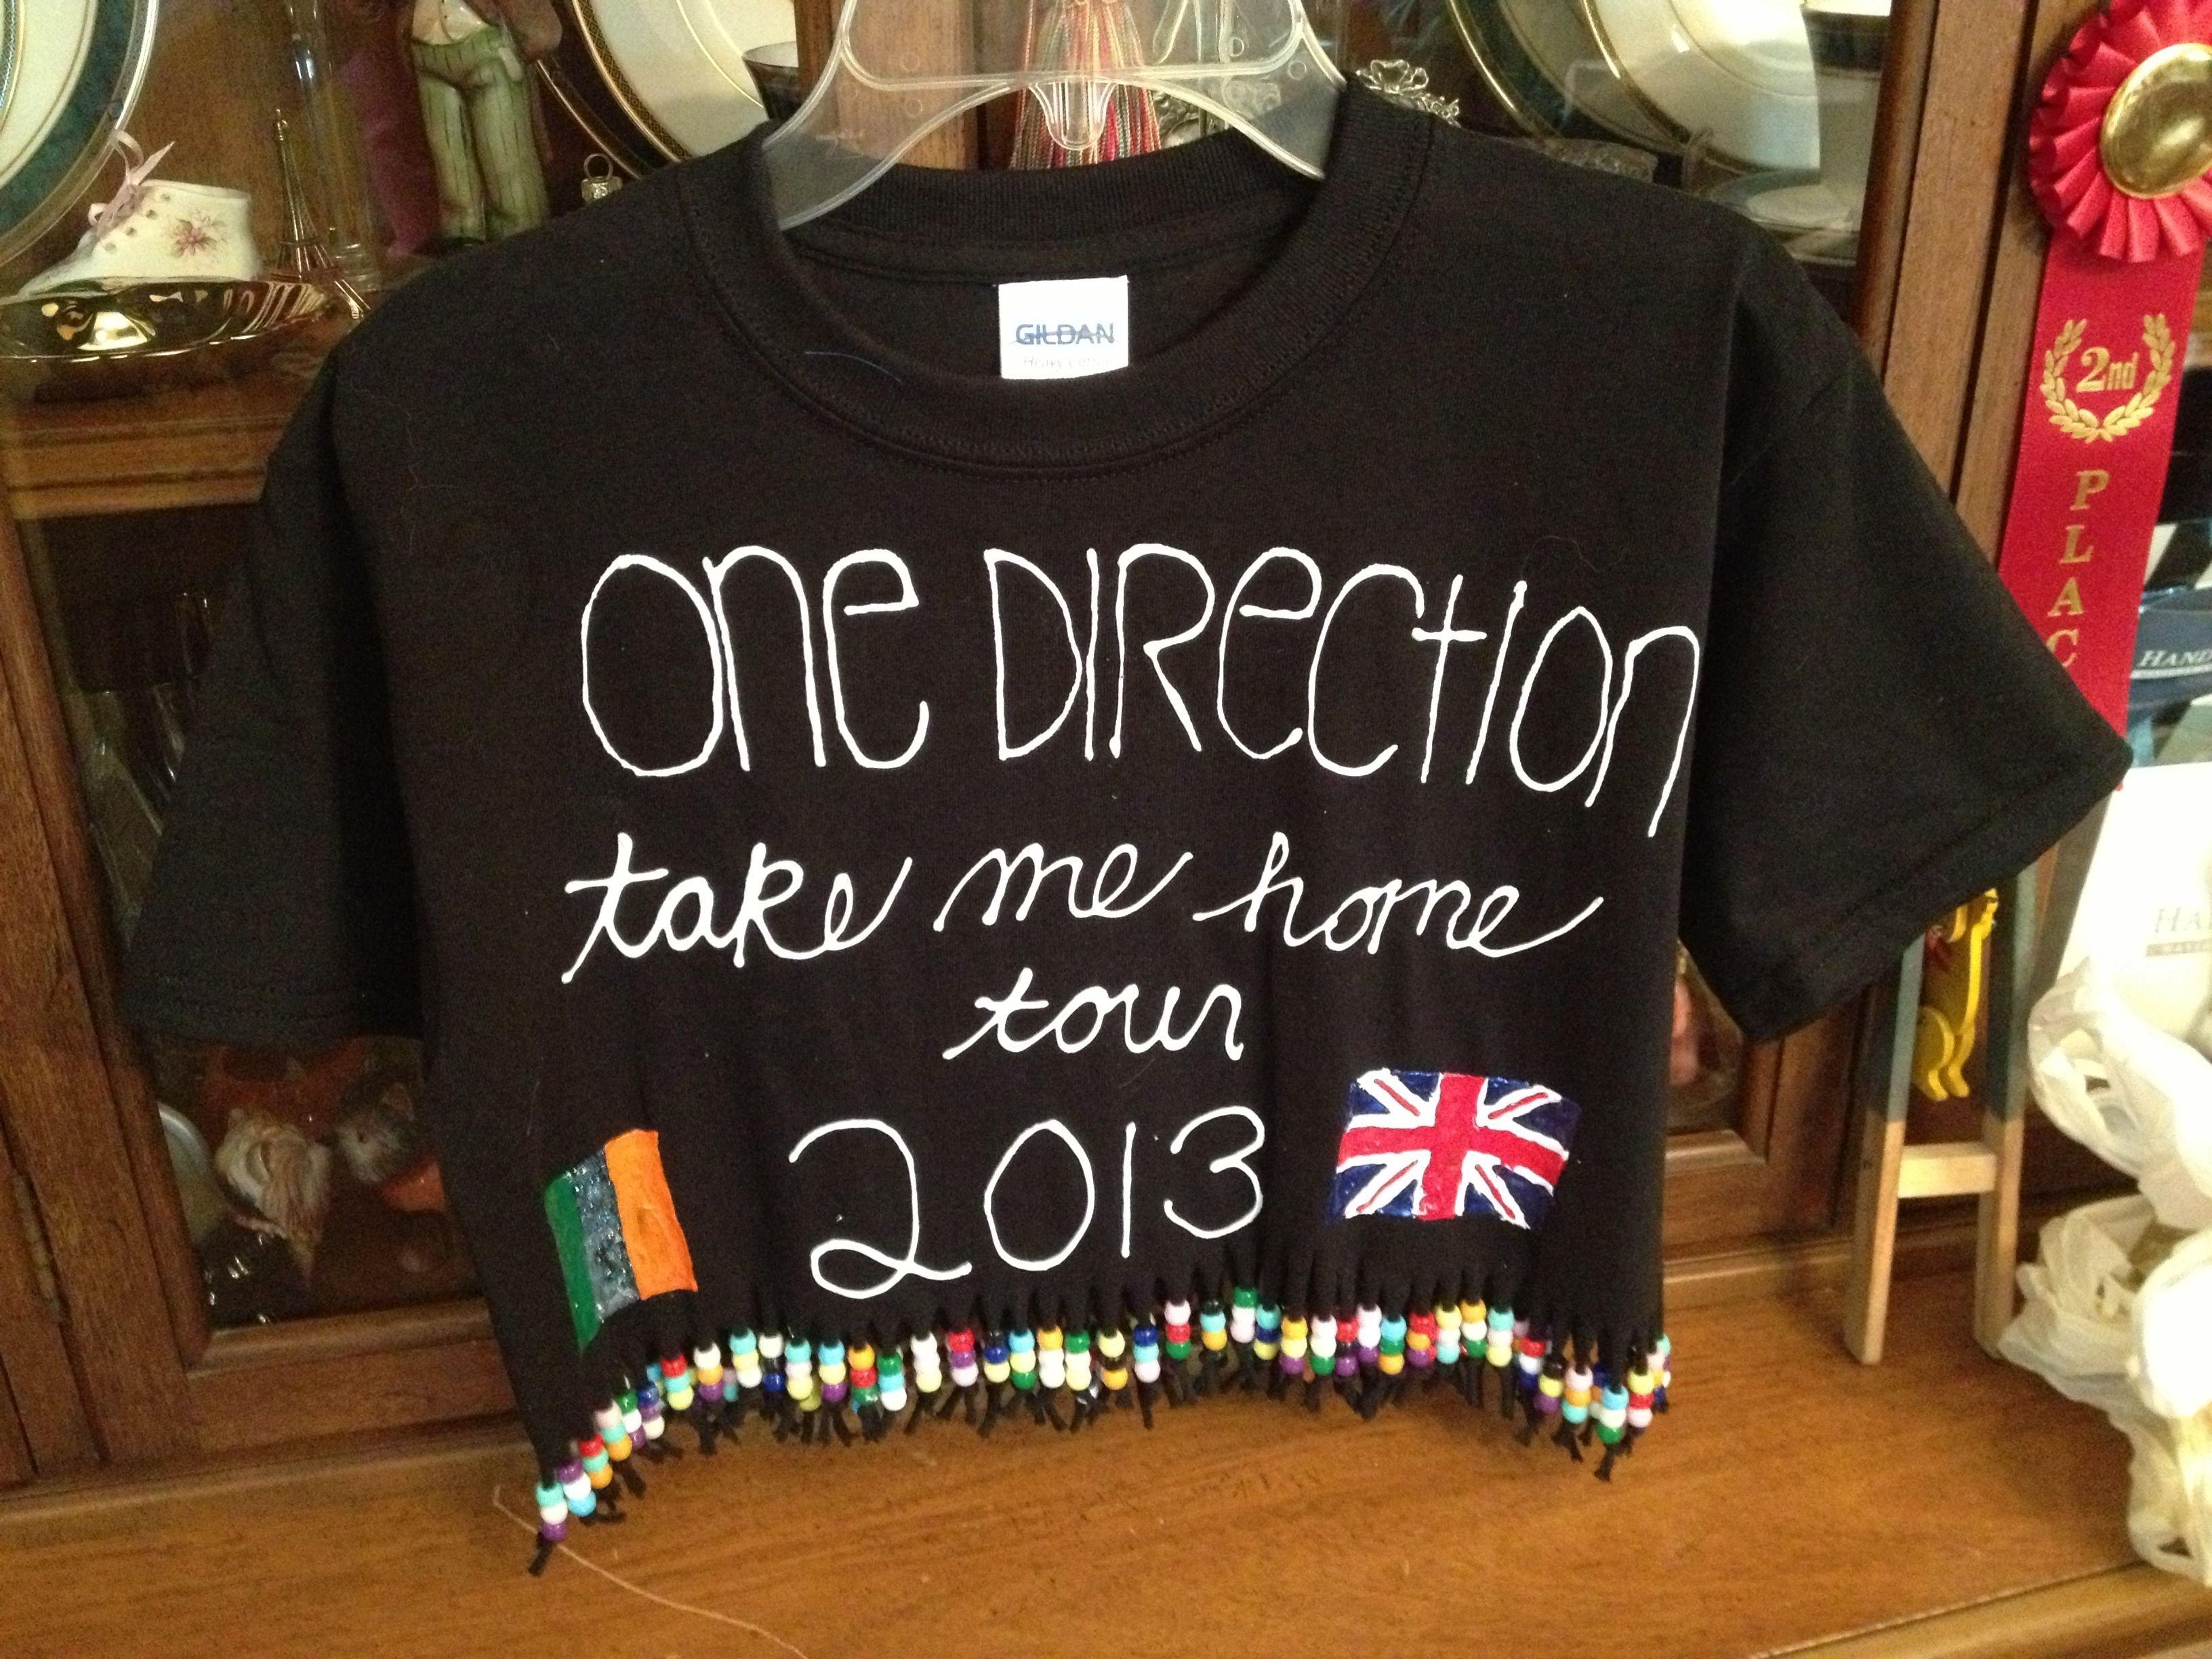 10 Elegant One Direction Shirt Ideas For Concert t shirt homemade with beads for one direction concert 6 25 13 diy 2020